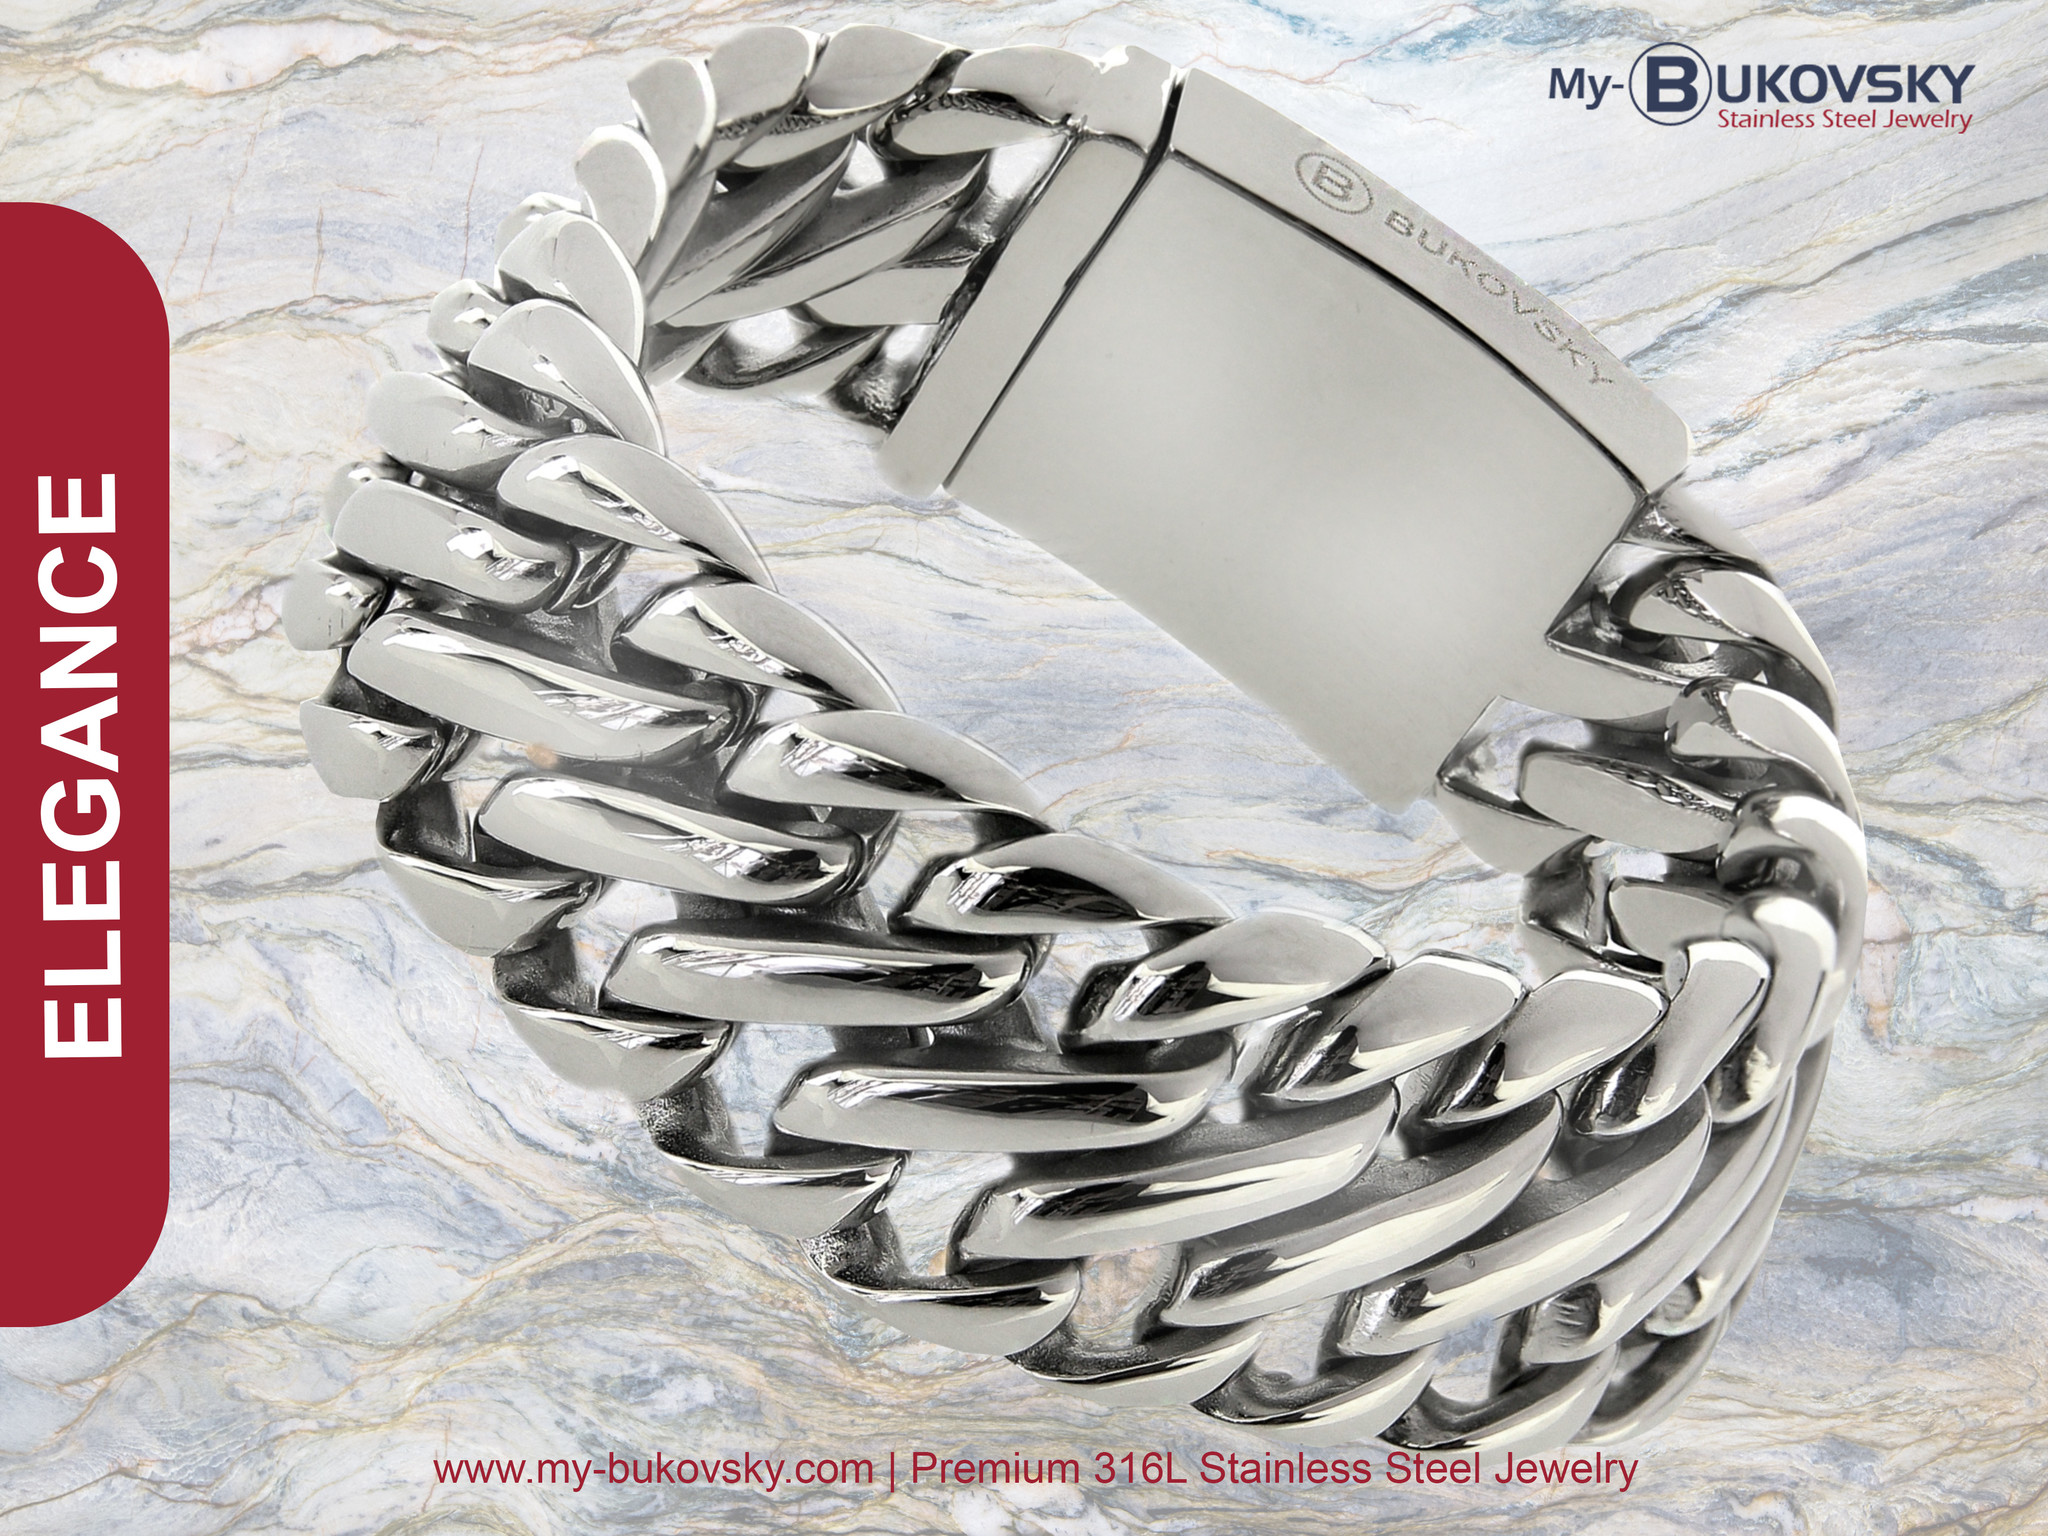 roestvrij-stalen-dames-armband-schakel-18cm-19cm-20cm-21cm-22cm-23cm-24cm-bukovsky-elegance-gepolijst-shiny-stainless-steel-moederdagcadeau.jpg